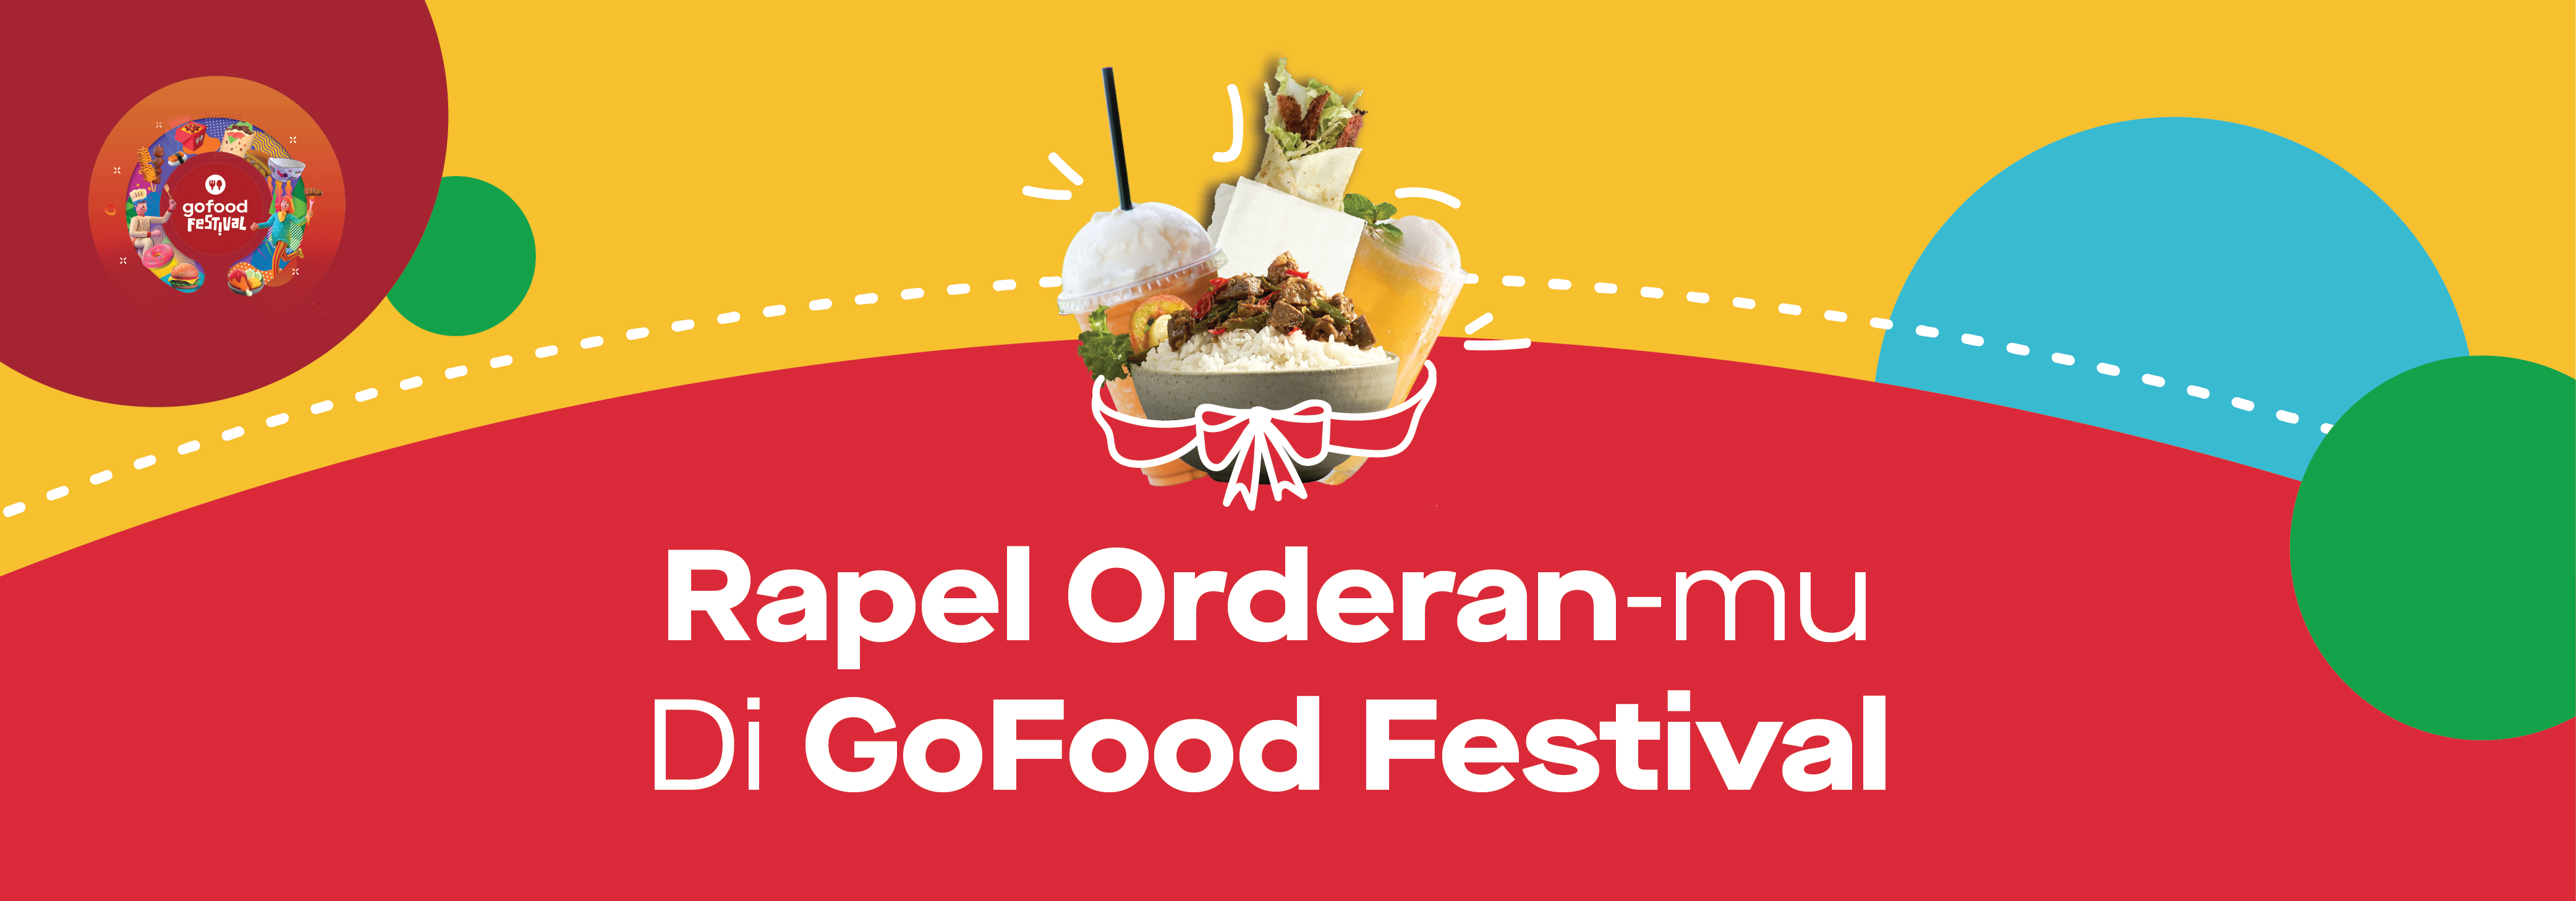 Promo Gofood Festival Oktober 2019 1x Order Dapet Rapel Orderan Gofood Festival